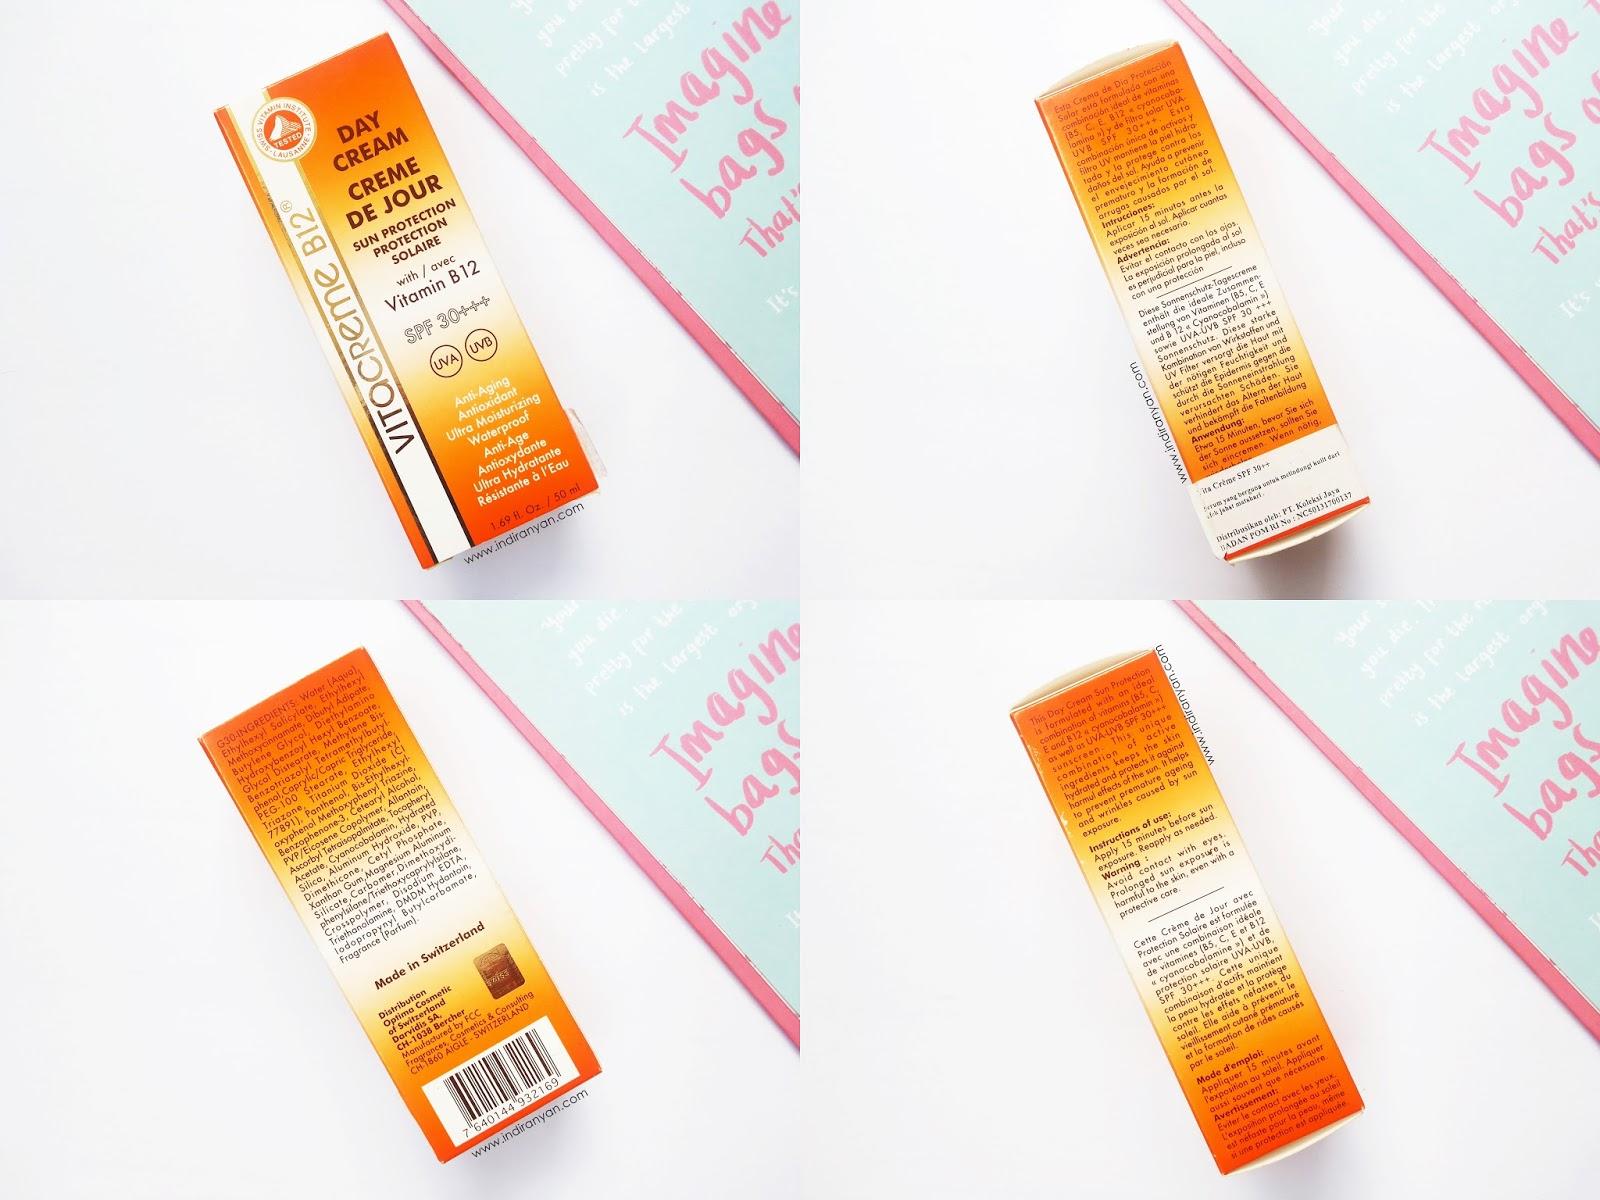 vitacreme-b12-day-cream